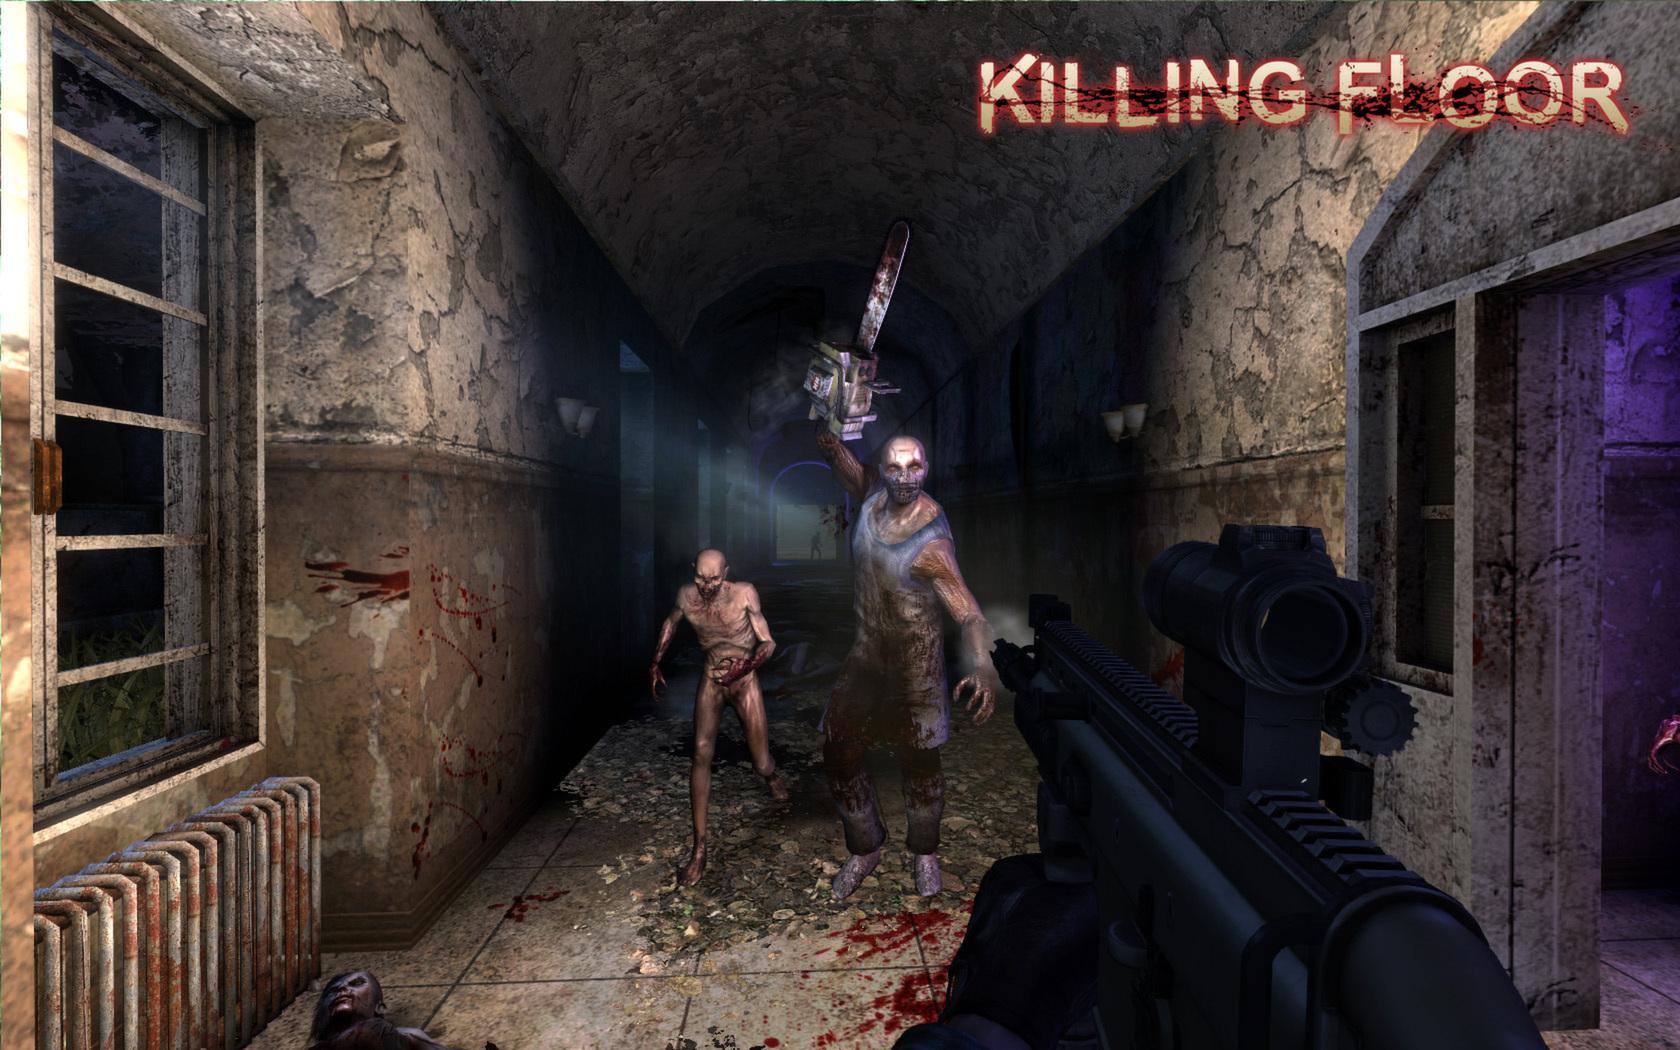 Killing floor 2 matchmaking, bangladeshi heroing naked pussy